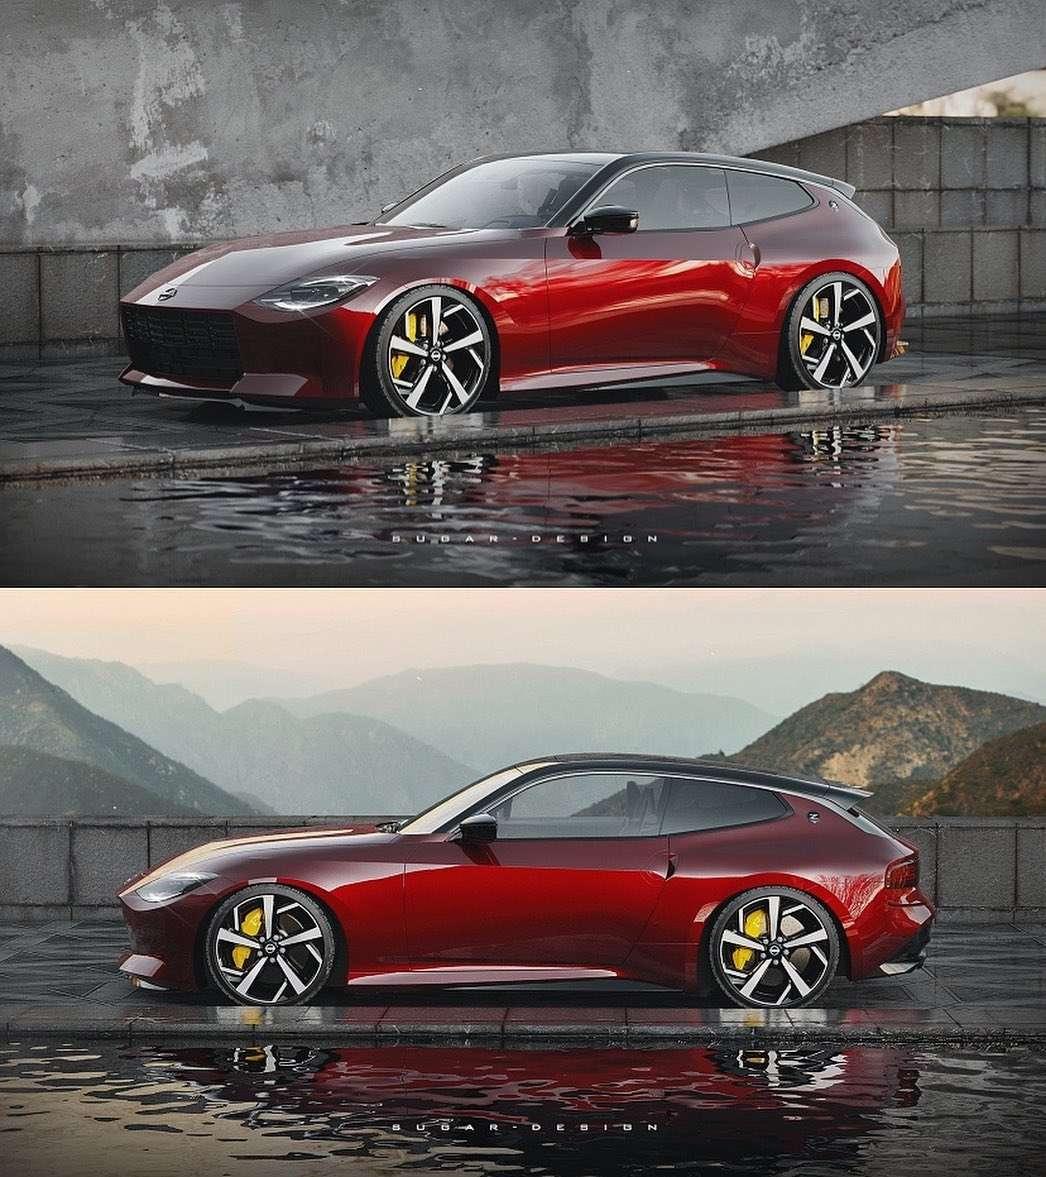 nissan-fairlady-400z-hatchback-rendering-looks-like-an-improved-z-car_3.jpg